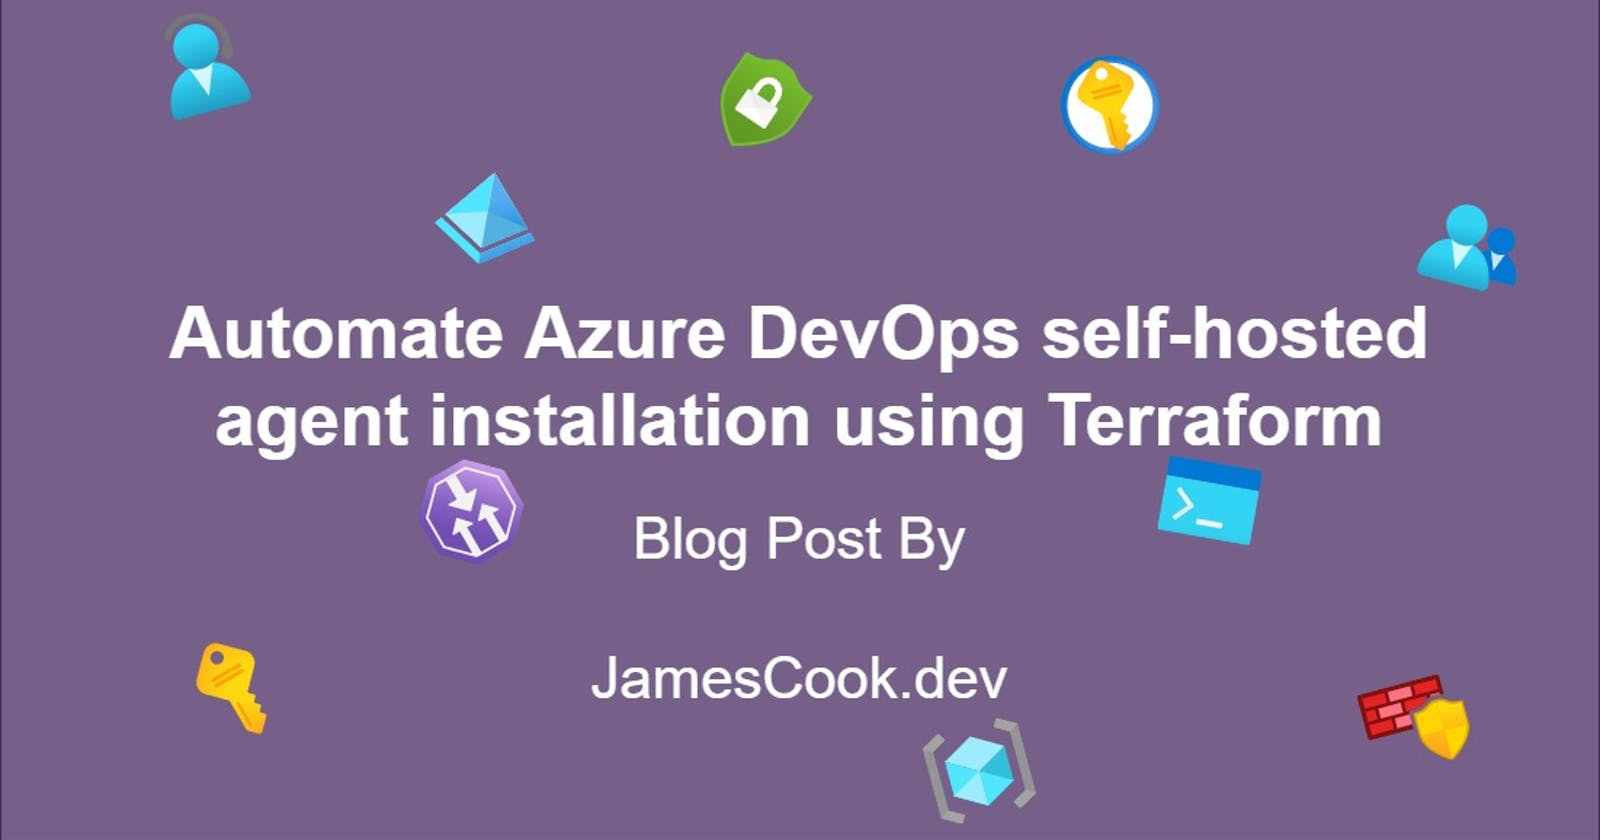 Automate Azure DevOps self-hosted agent installation using Terraform